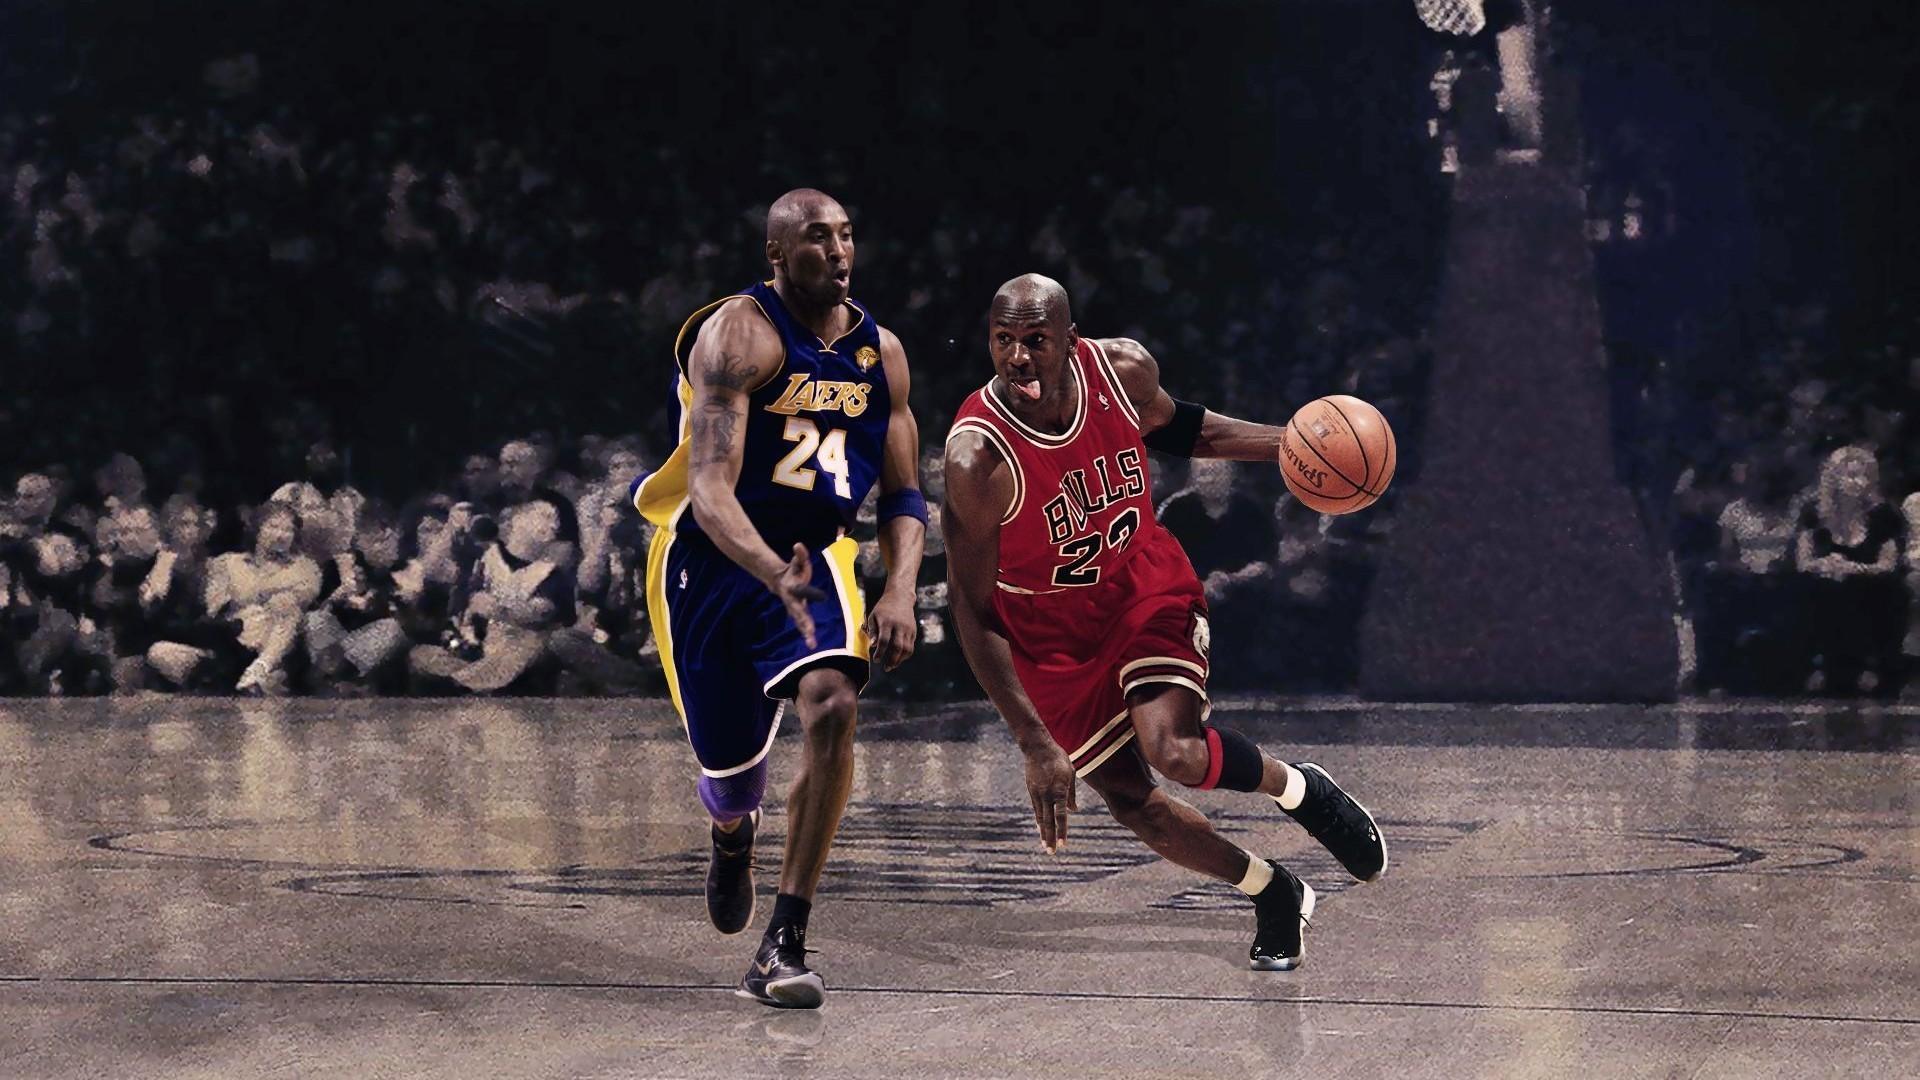 Nike Wallpaper Nba Player: NBA Basketball Wallpaper 2018 (63+ Images